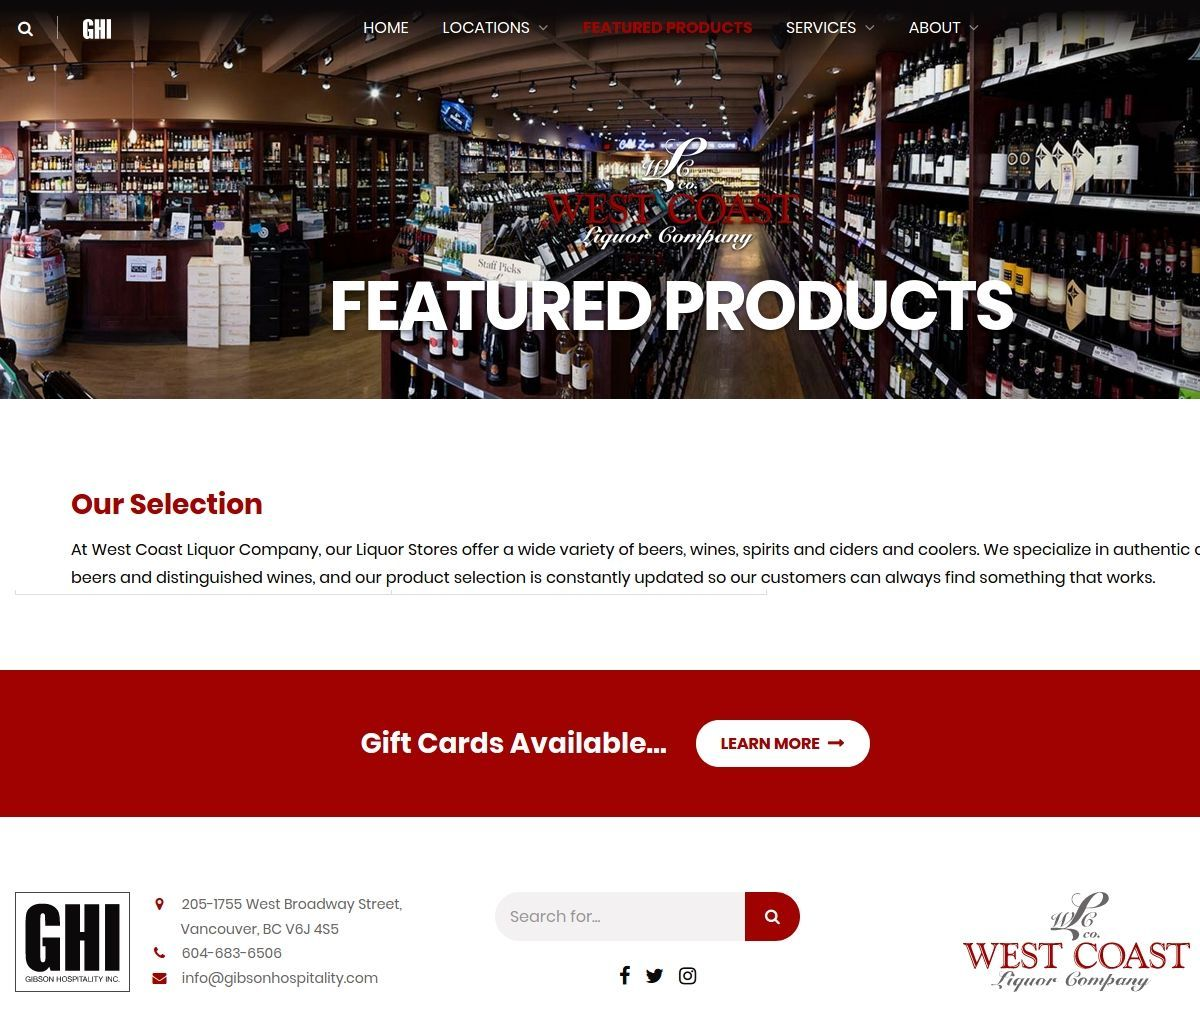 Liquor Store Near Current Location 🥃 Find Nearby Liquor